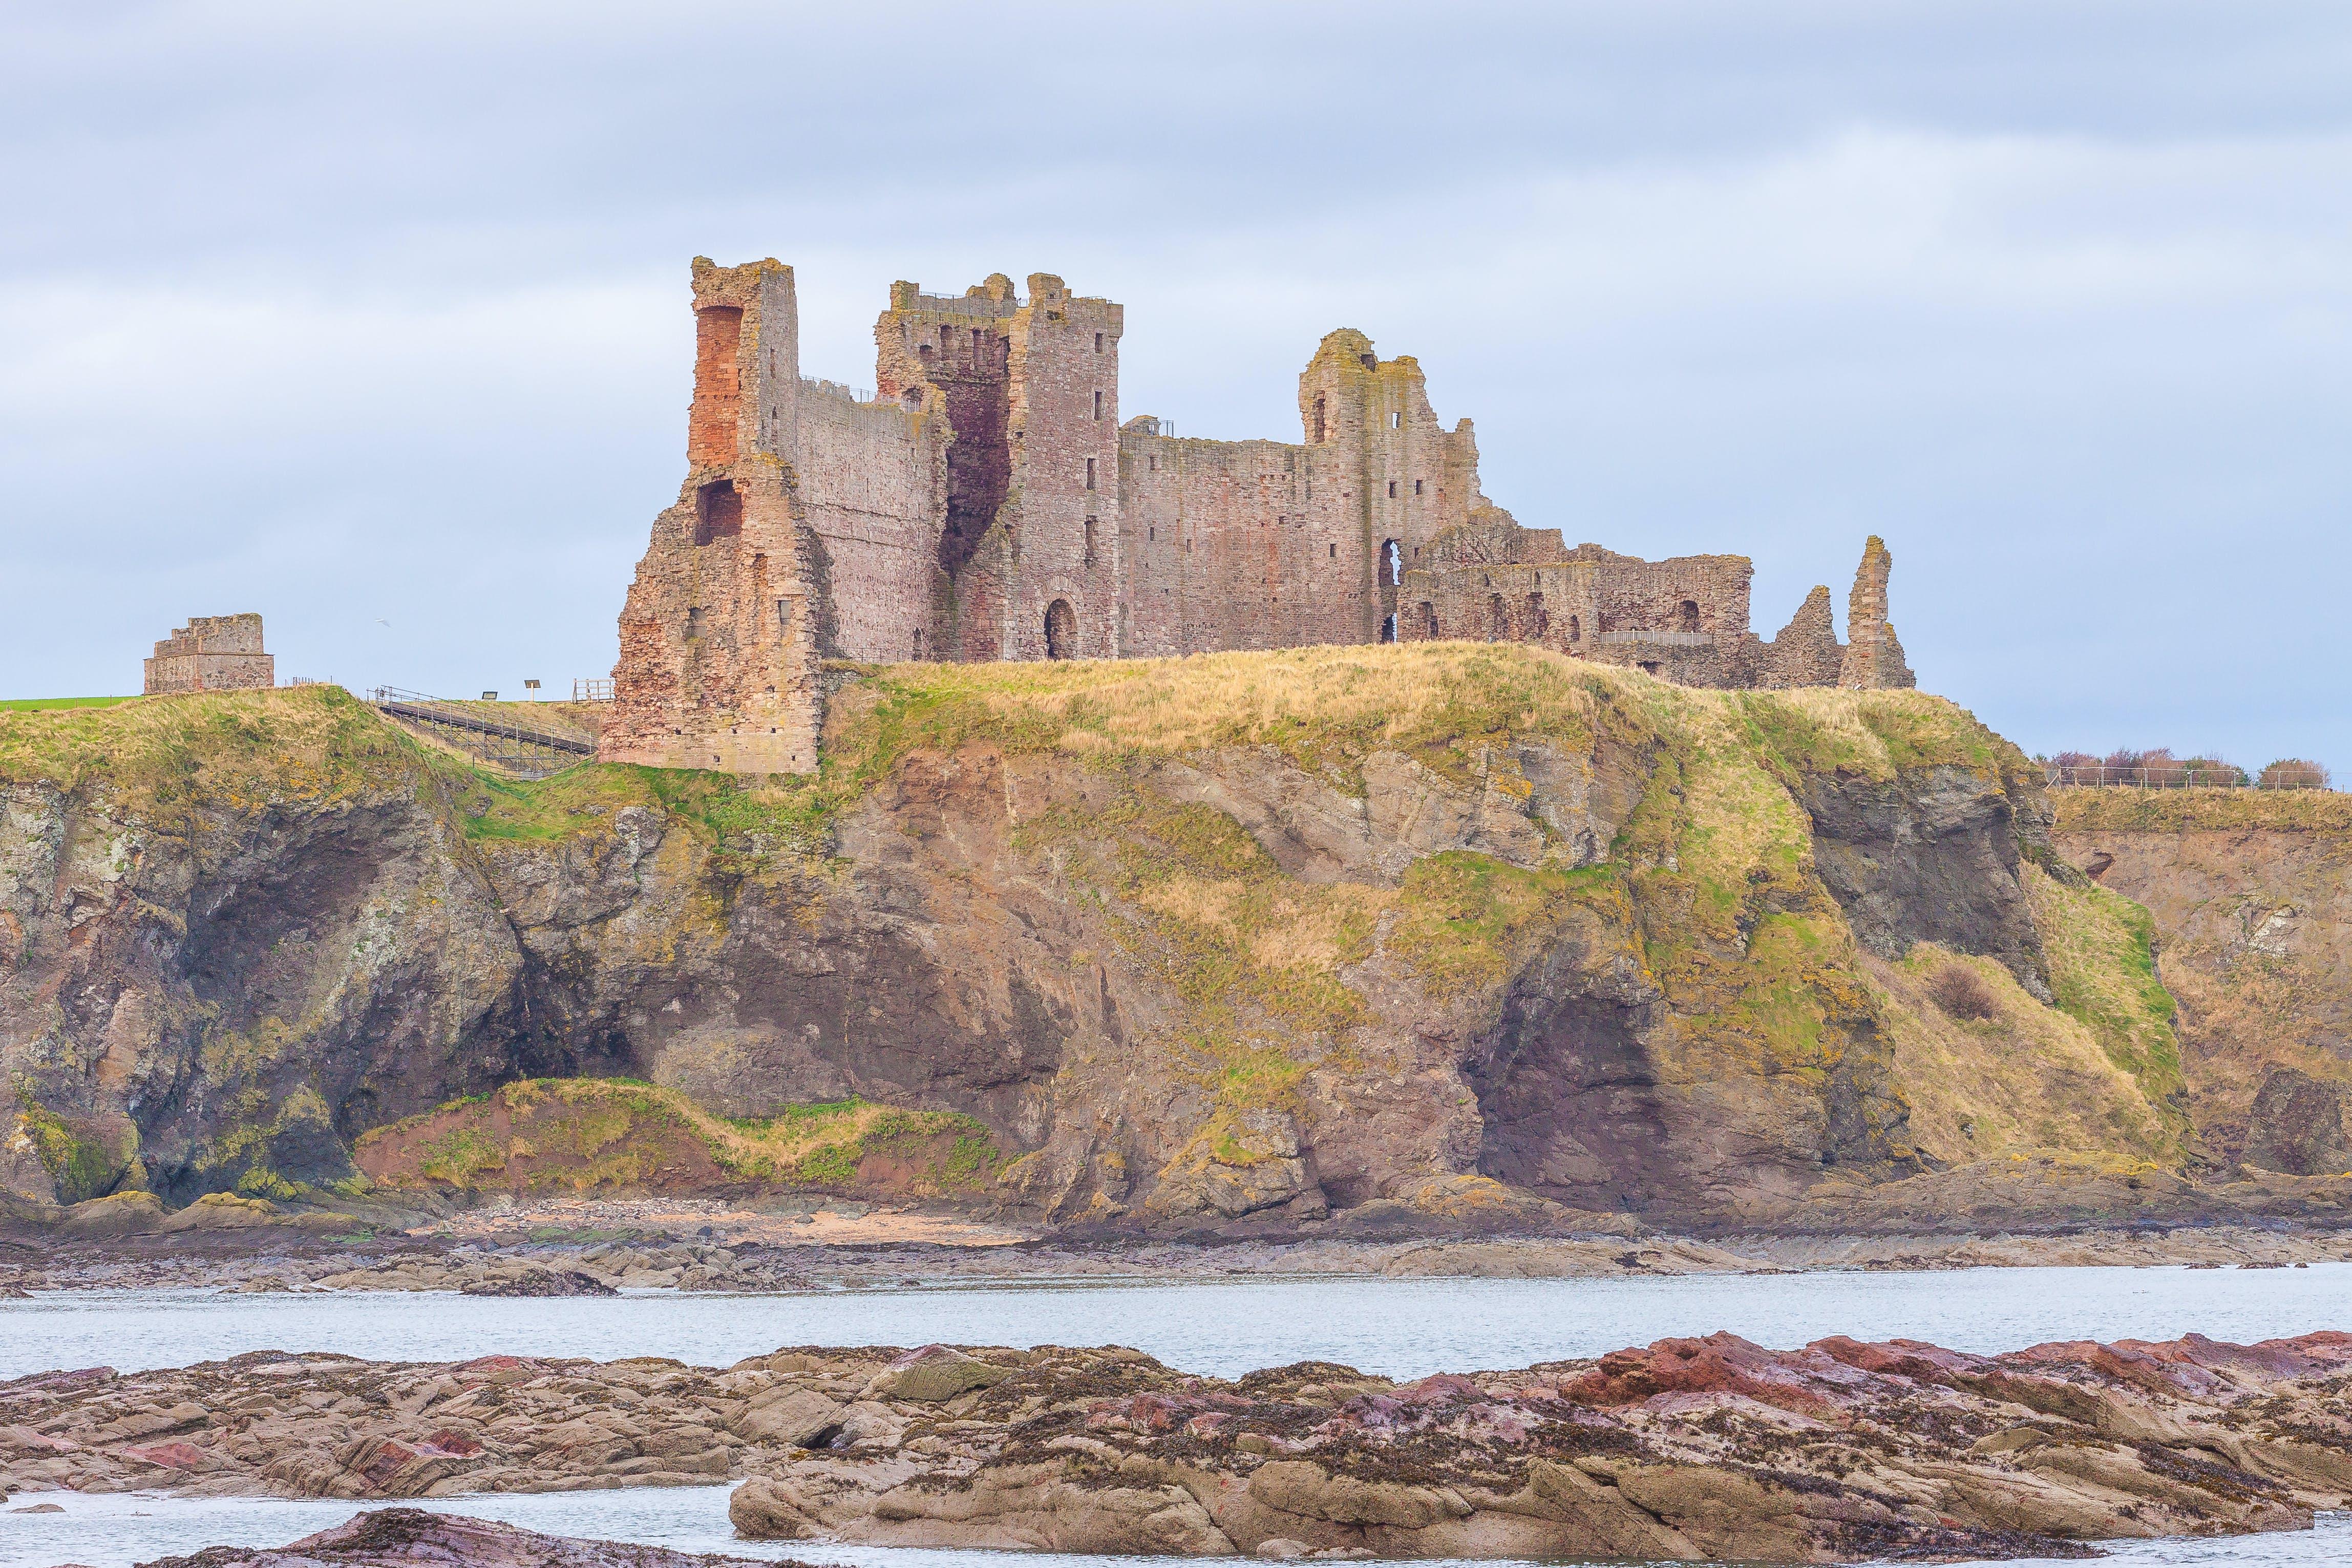 Free stock photo of beach, castle, cliff, mirophotography.wordpress.com